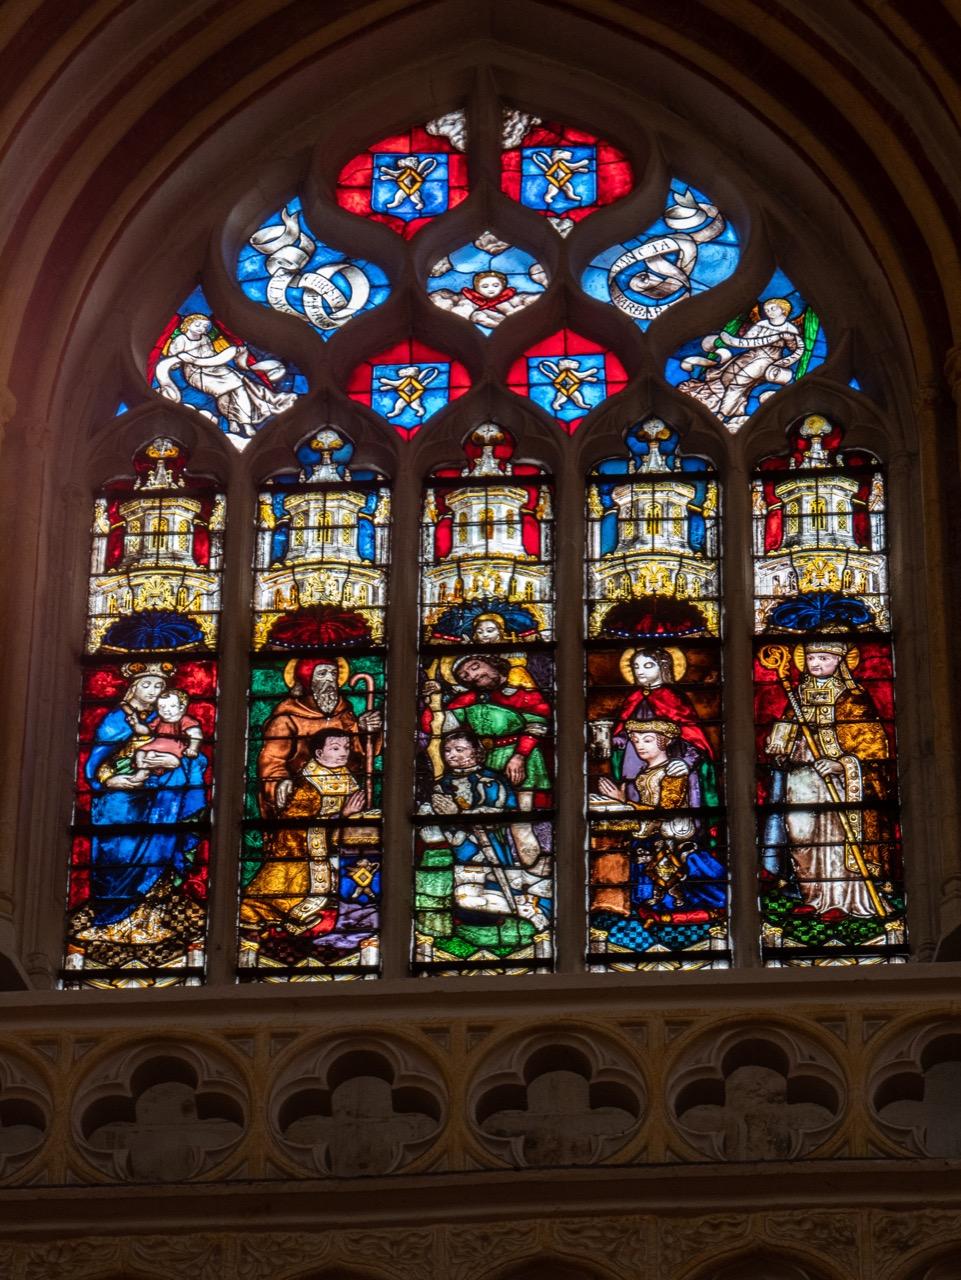 Obergadenfenster im Langhaus mit Personen aus Kerguelenen (Jamin Soyer, Ende 15. Jh.)